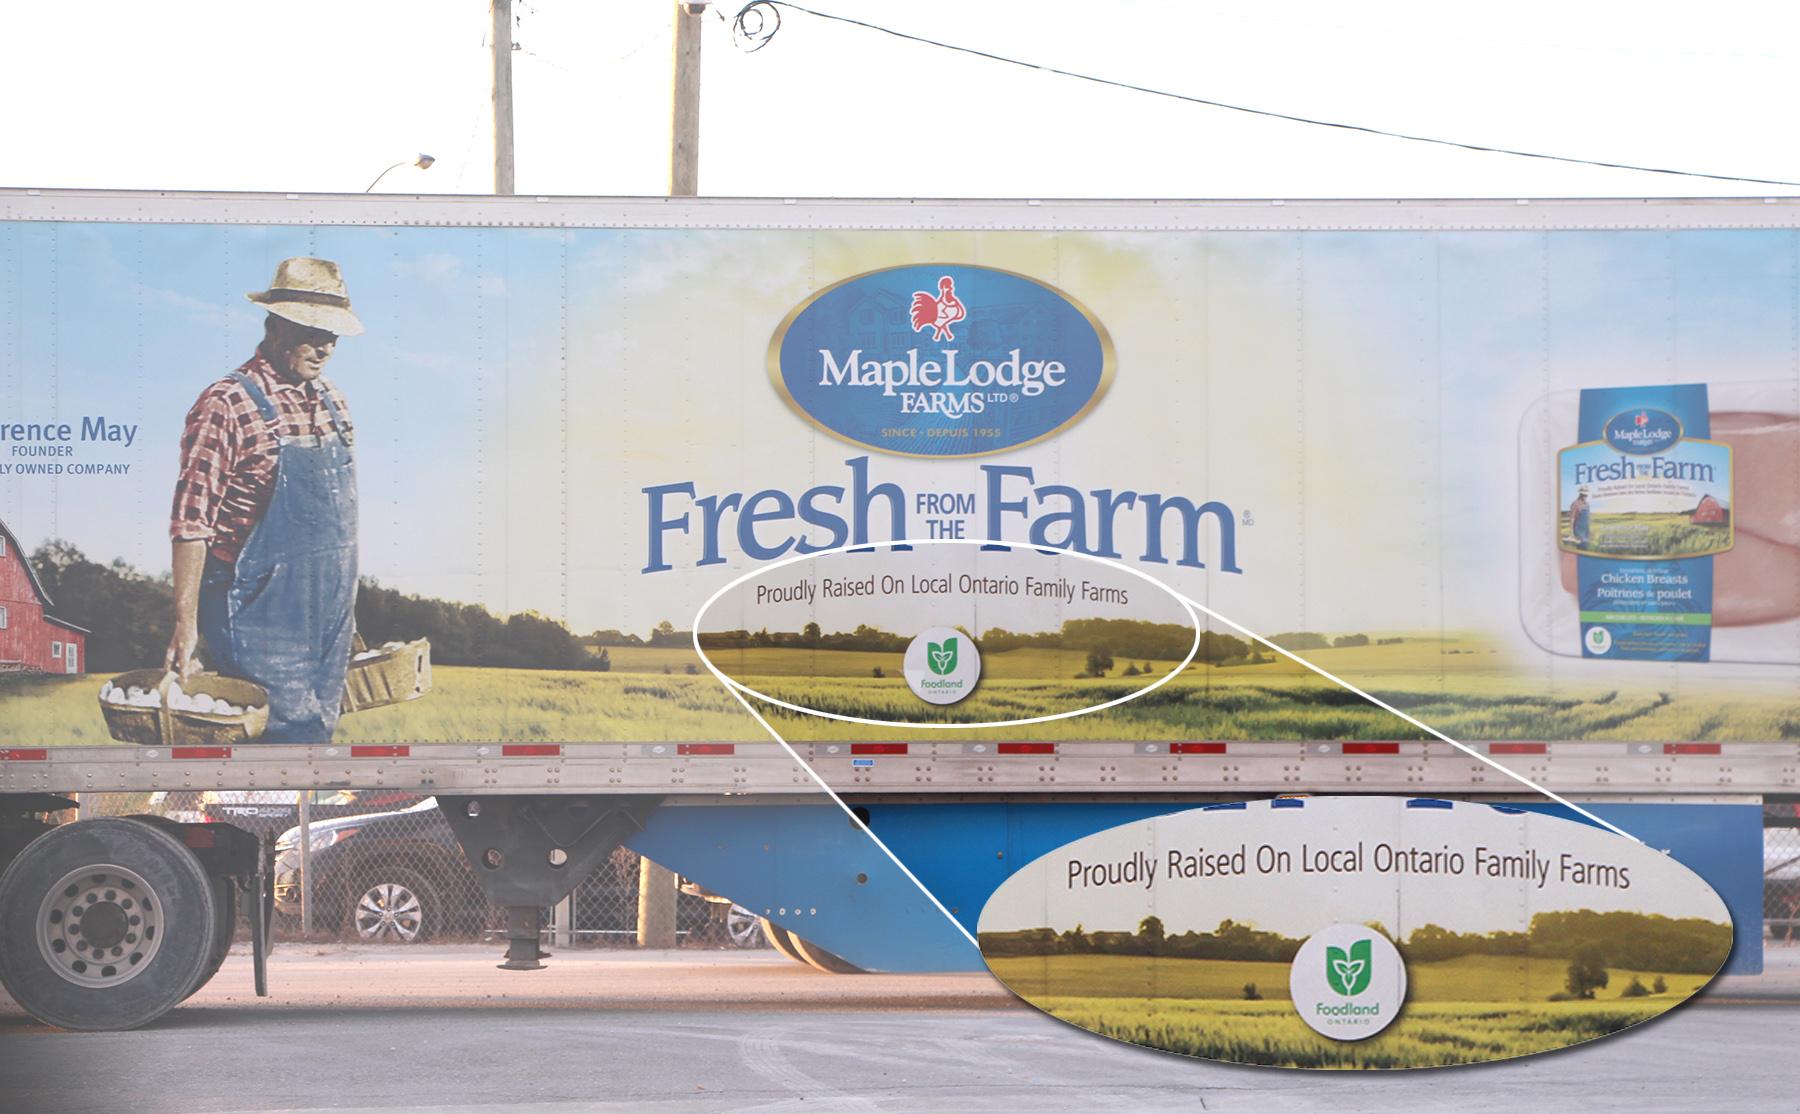 False_advertising_Maple_Lodge_Farms.jpg